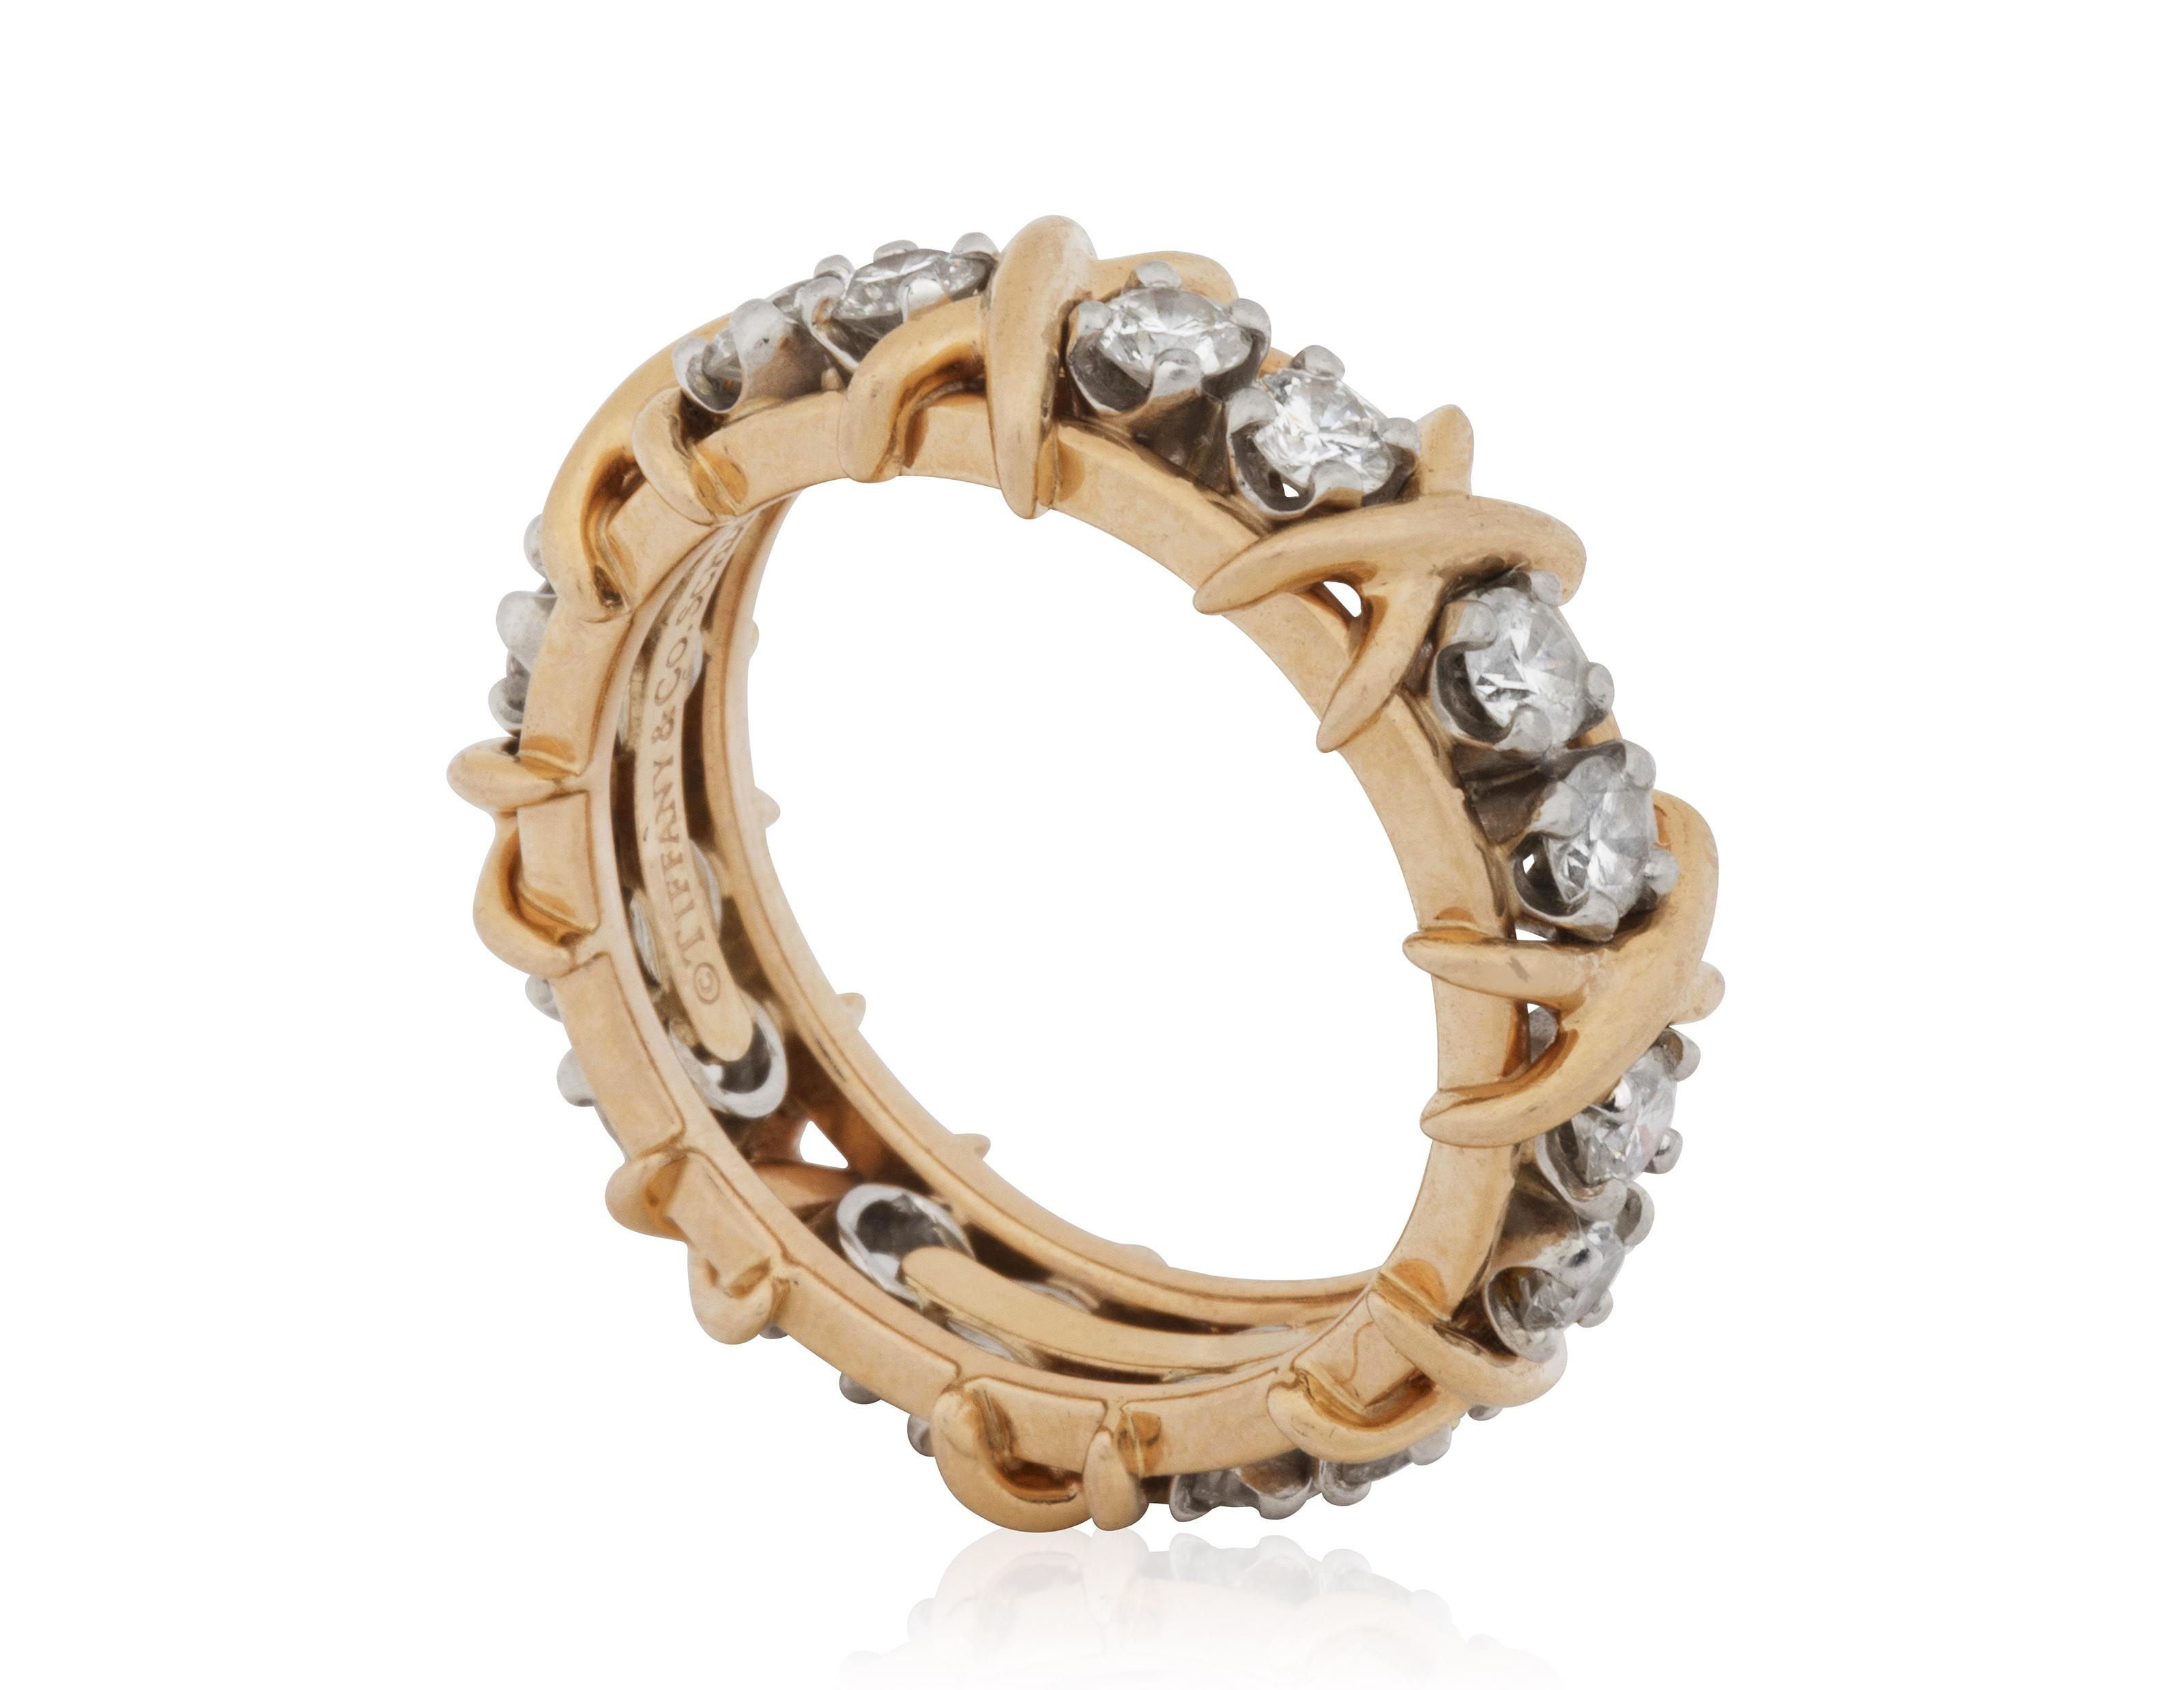 2bdc67c5c TIFFANY & CO. SCHLUMBERGER 'SIXTEEN STONE' DIAMOND RING, | Christie's